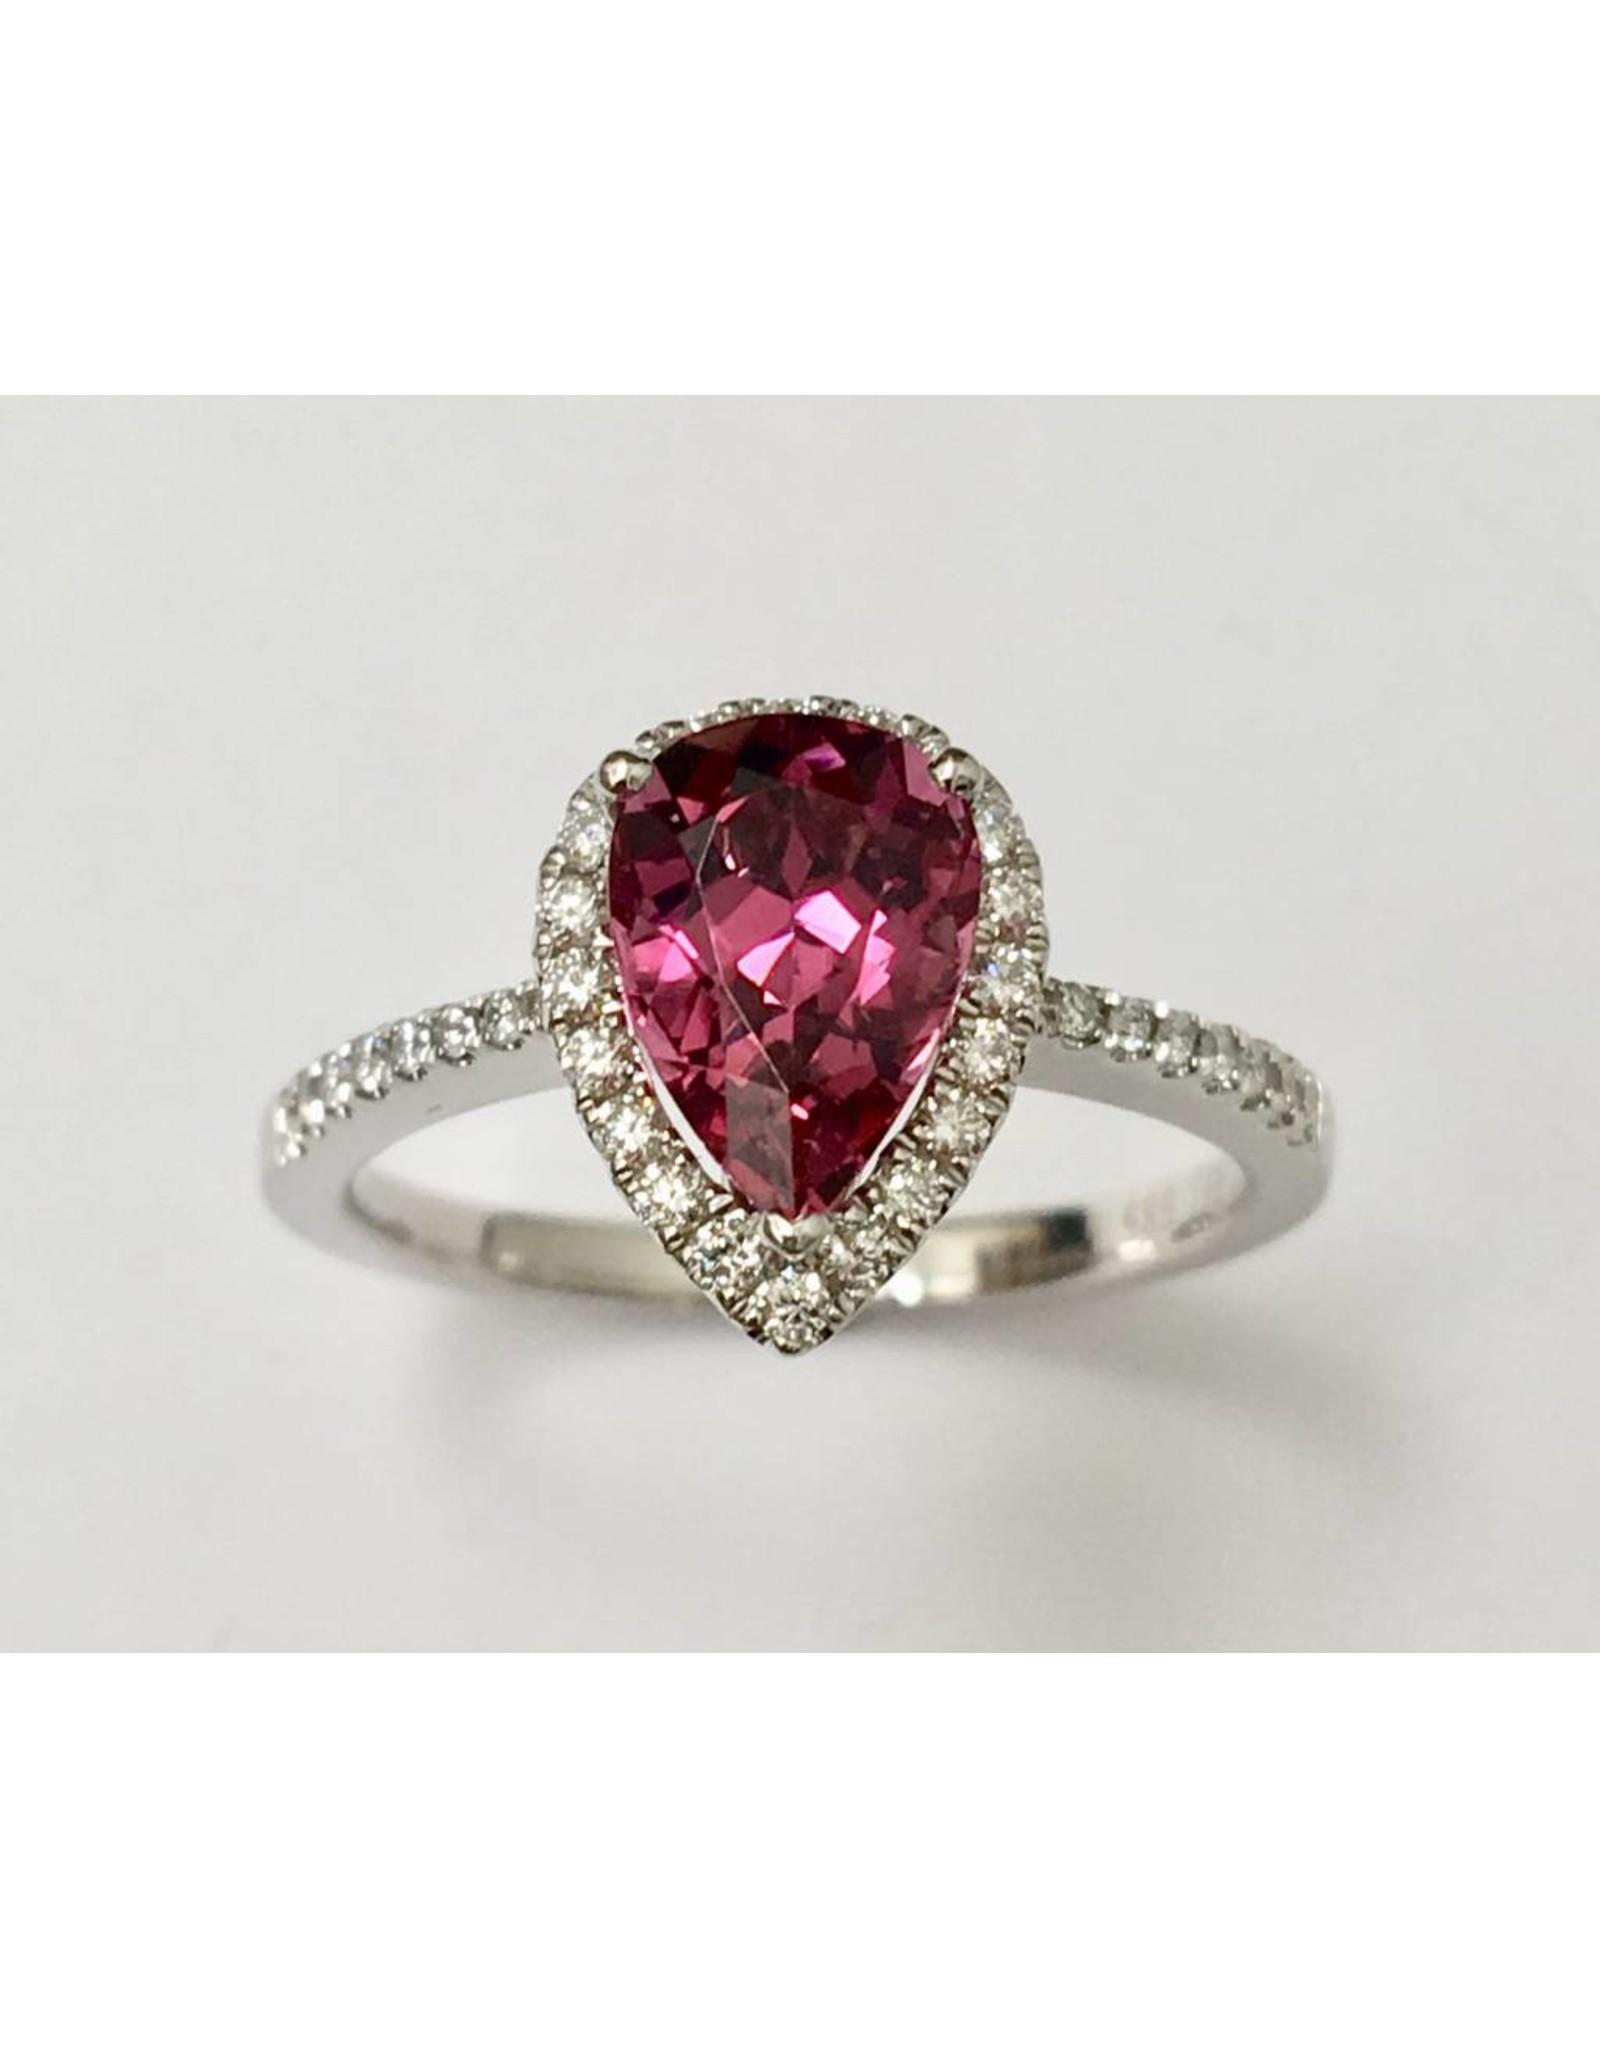 Pink Tourmaline & Diamond Ring 14KW